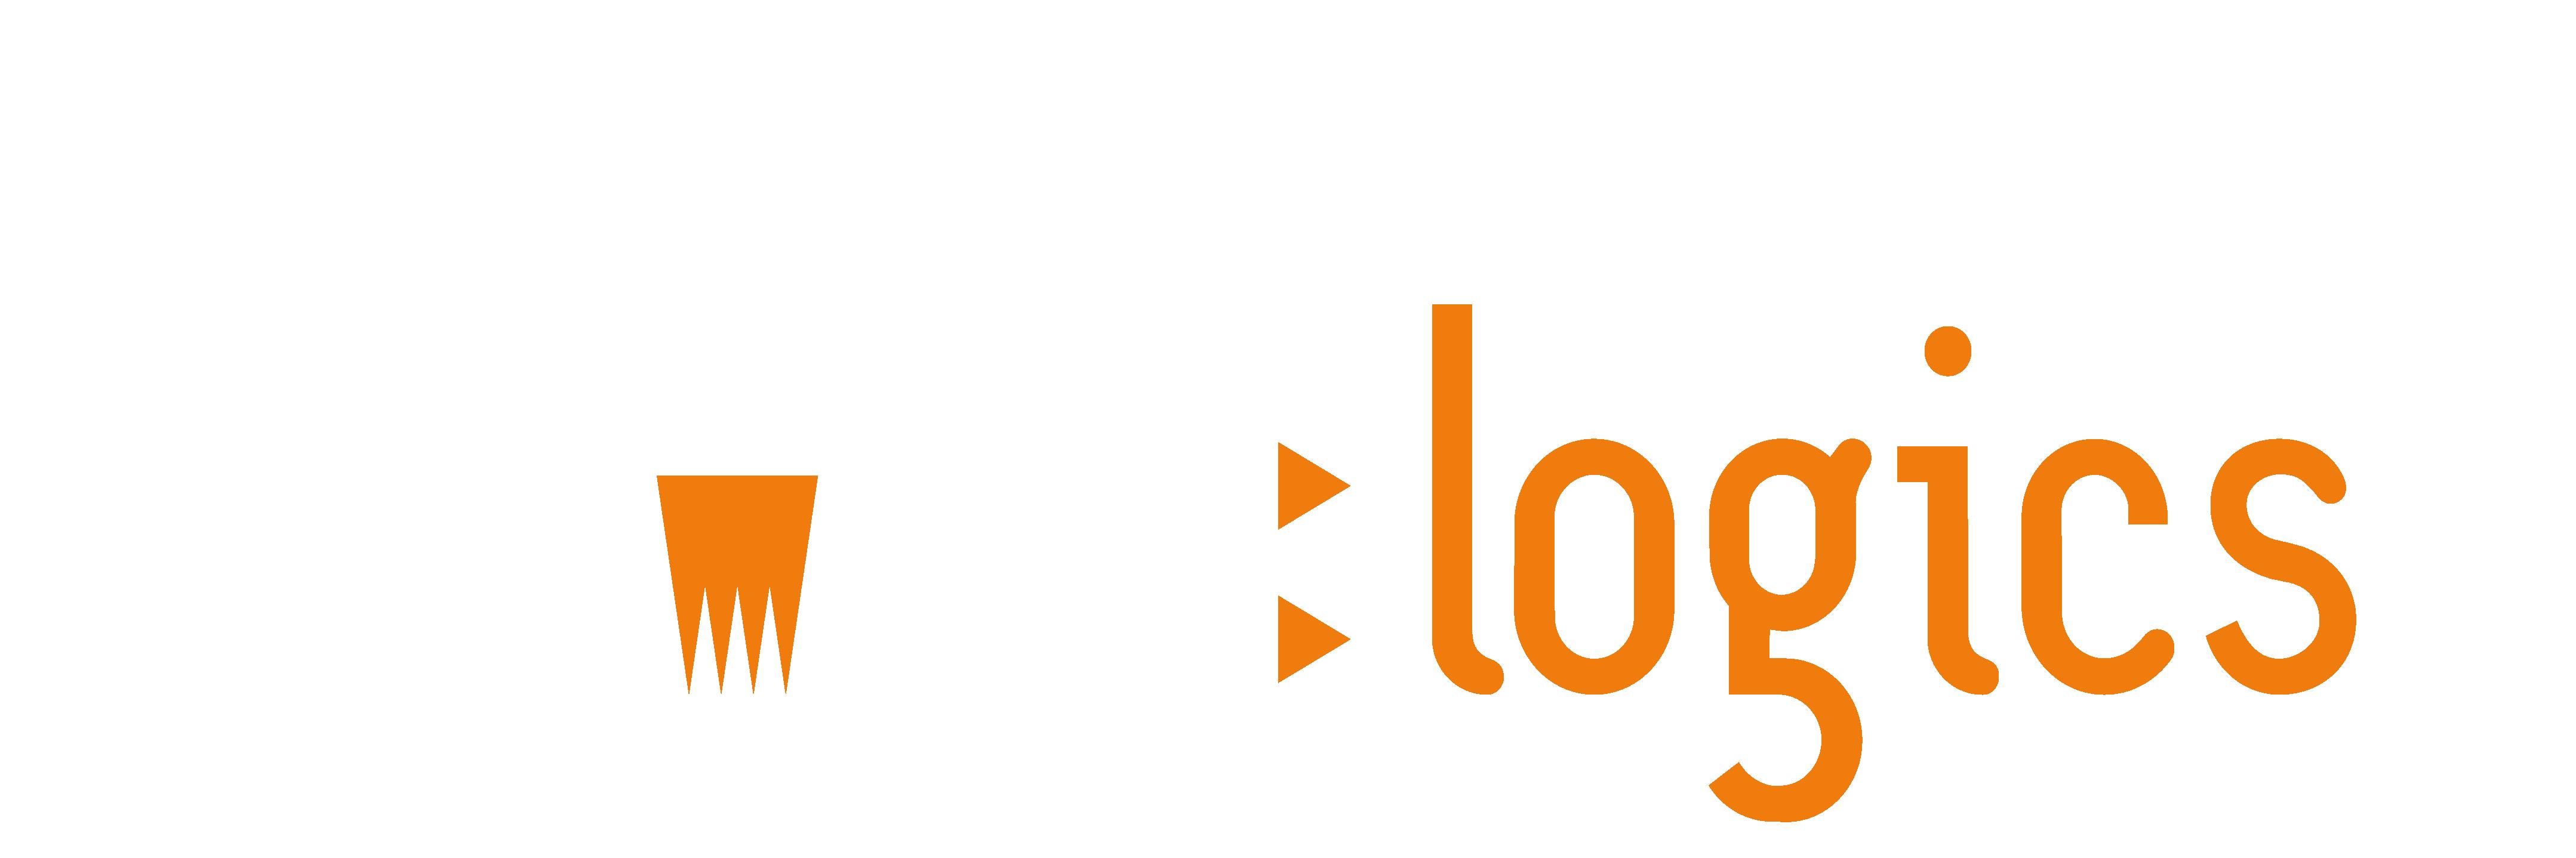 Rocket Logo - Logics White_Orange-1